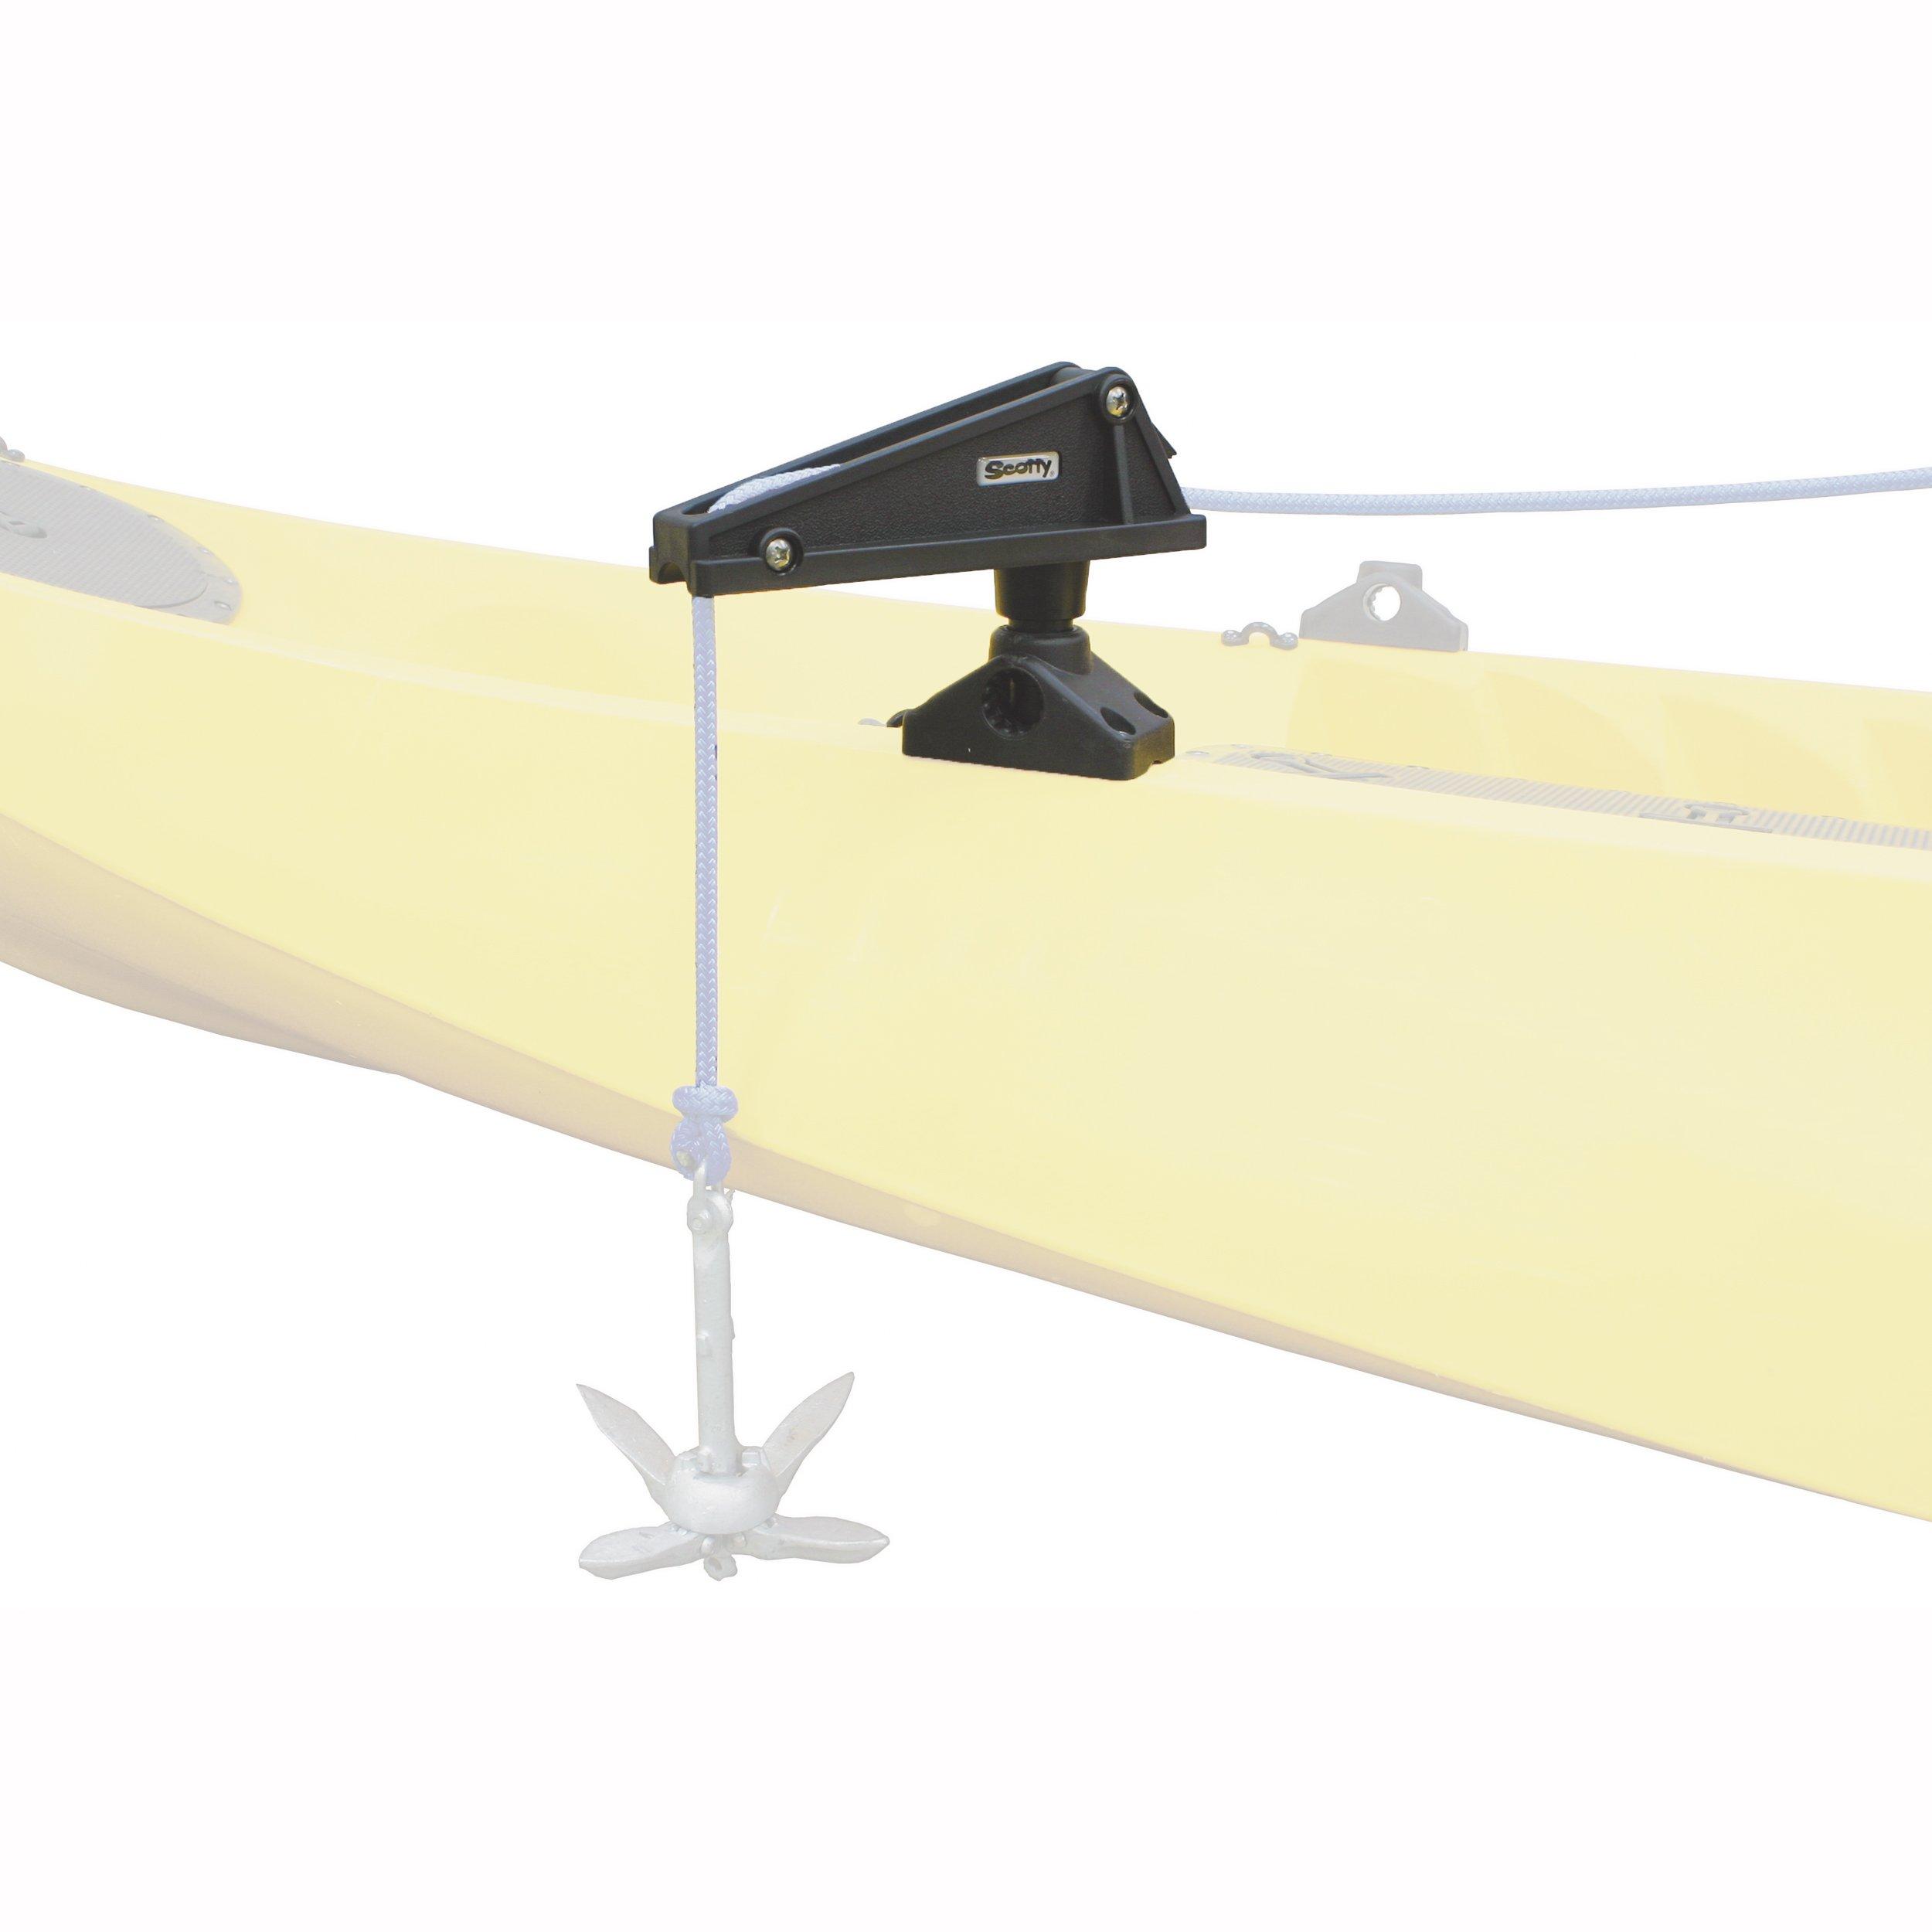 Scotty #276 Anchor Lock w/ #241 Side Deck Mount